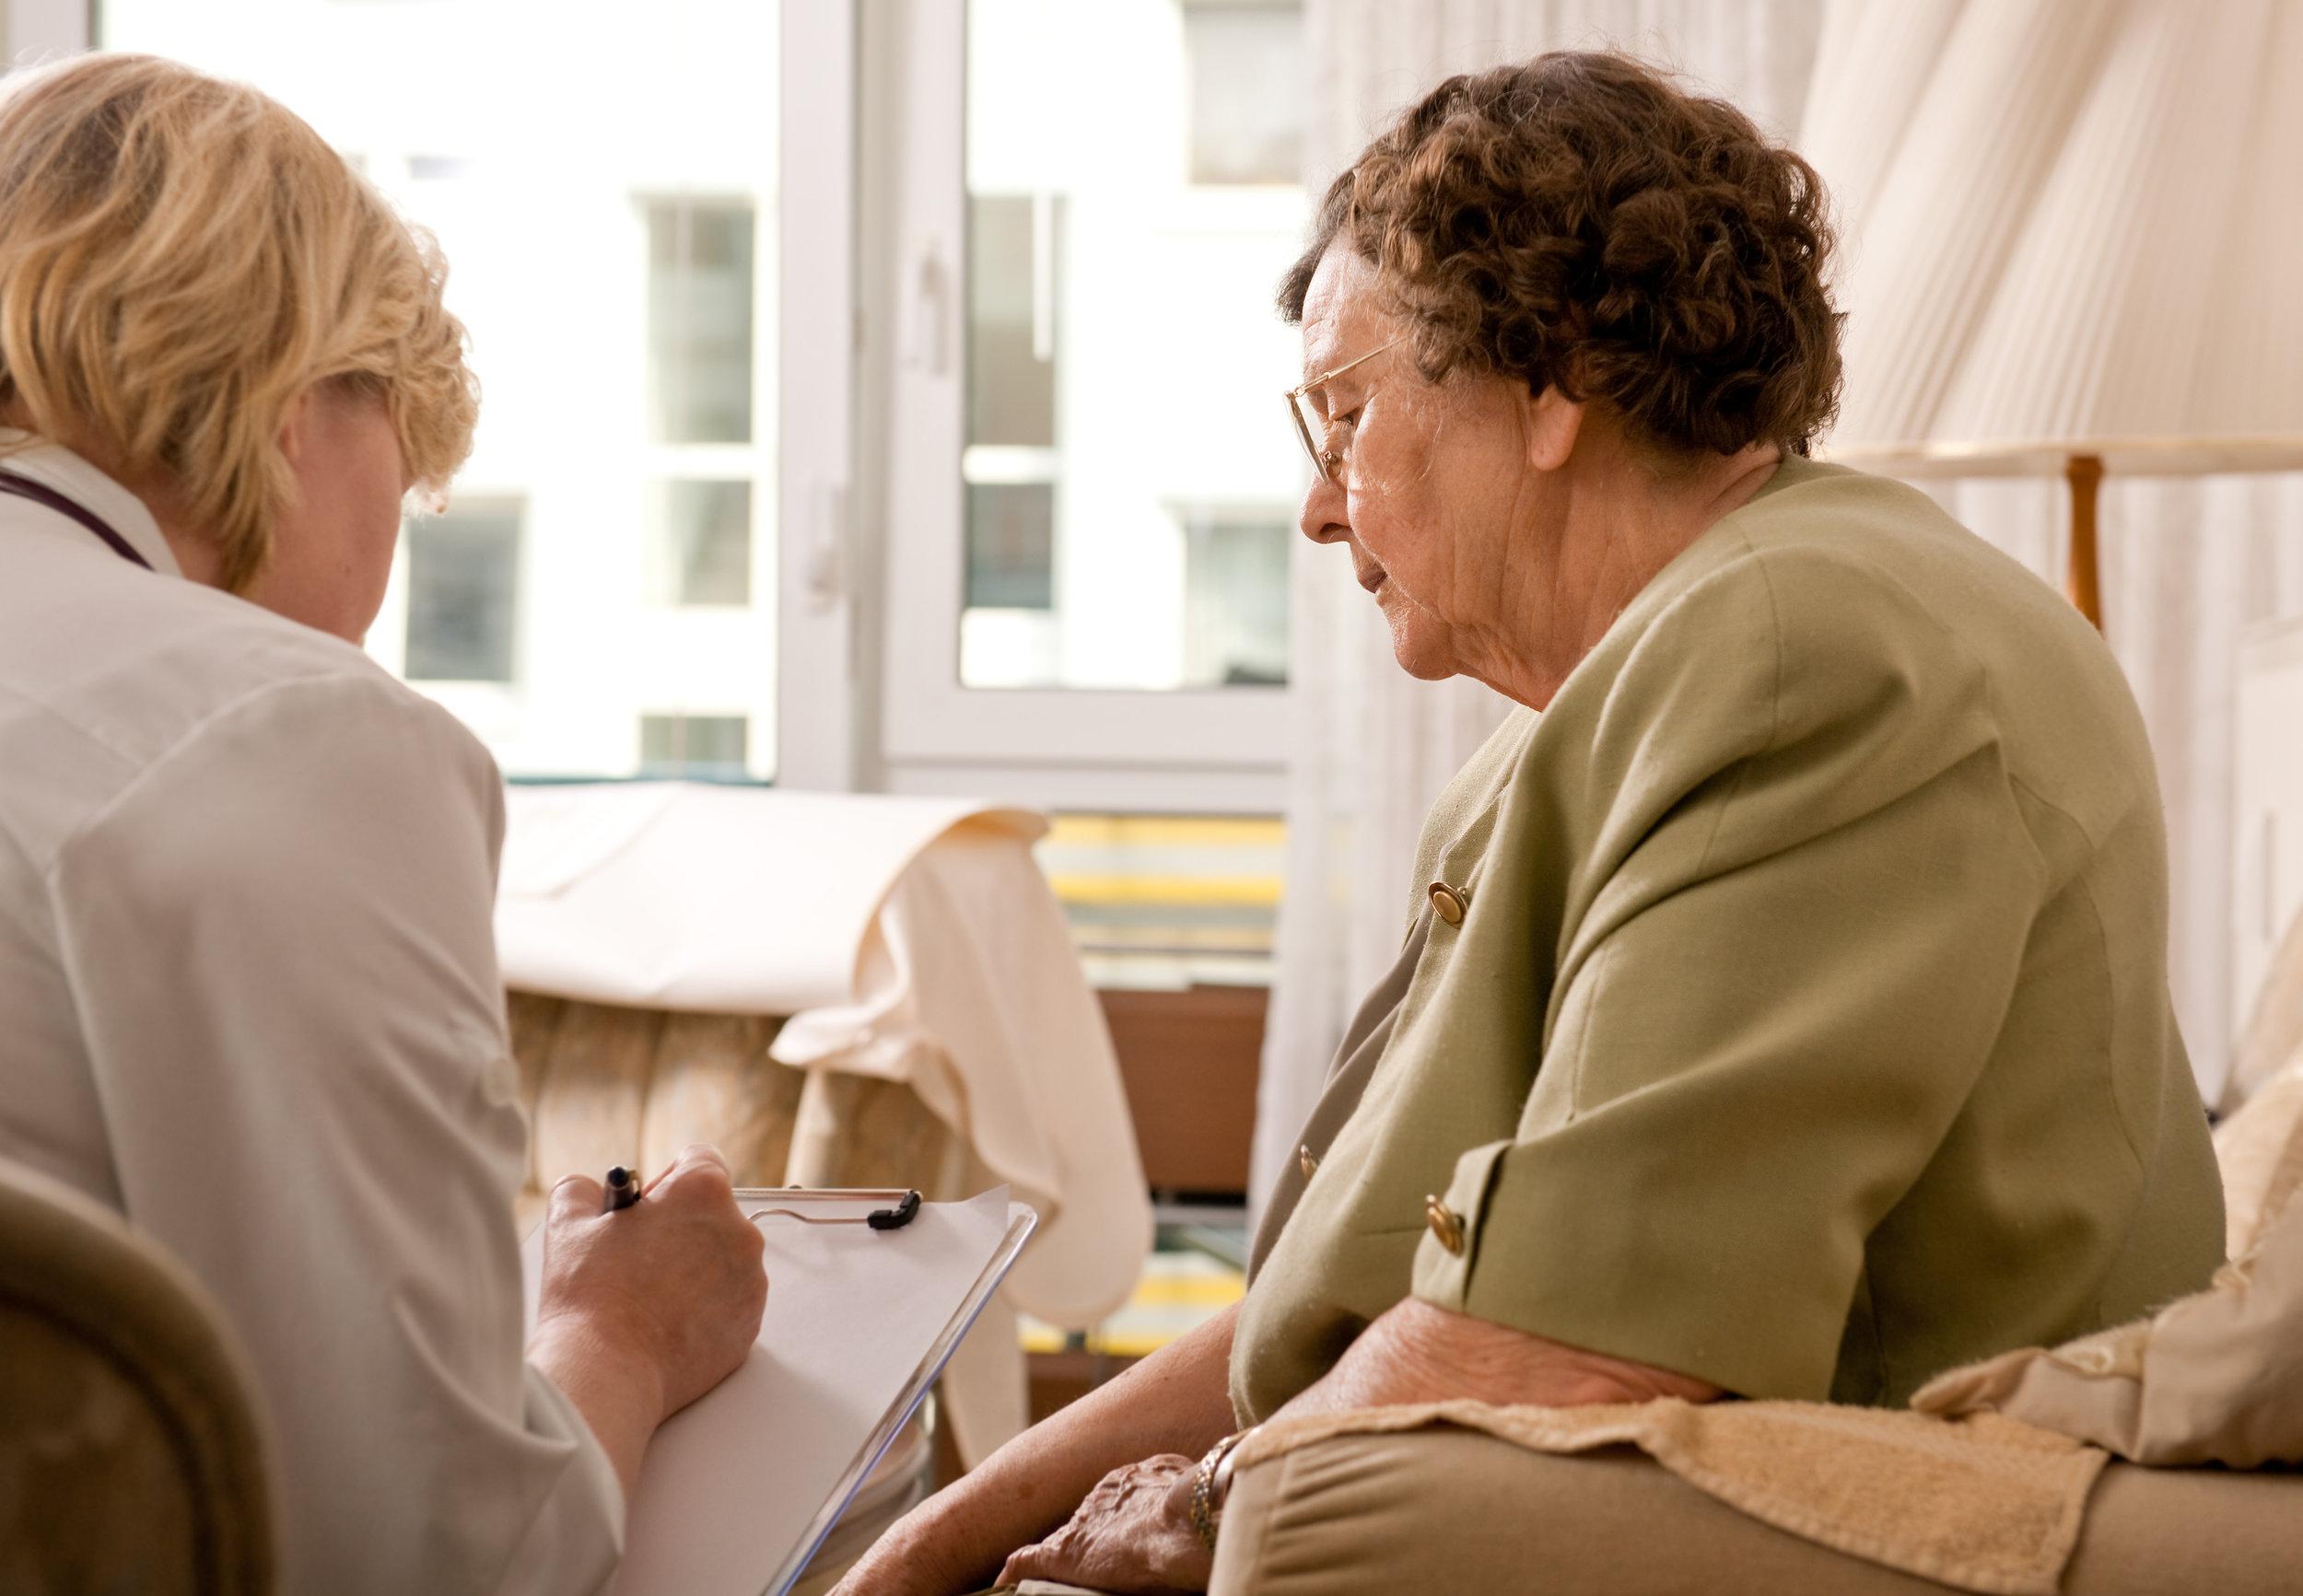 bigstock-Nursing-home-6183836.jpg